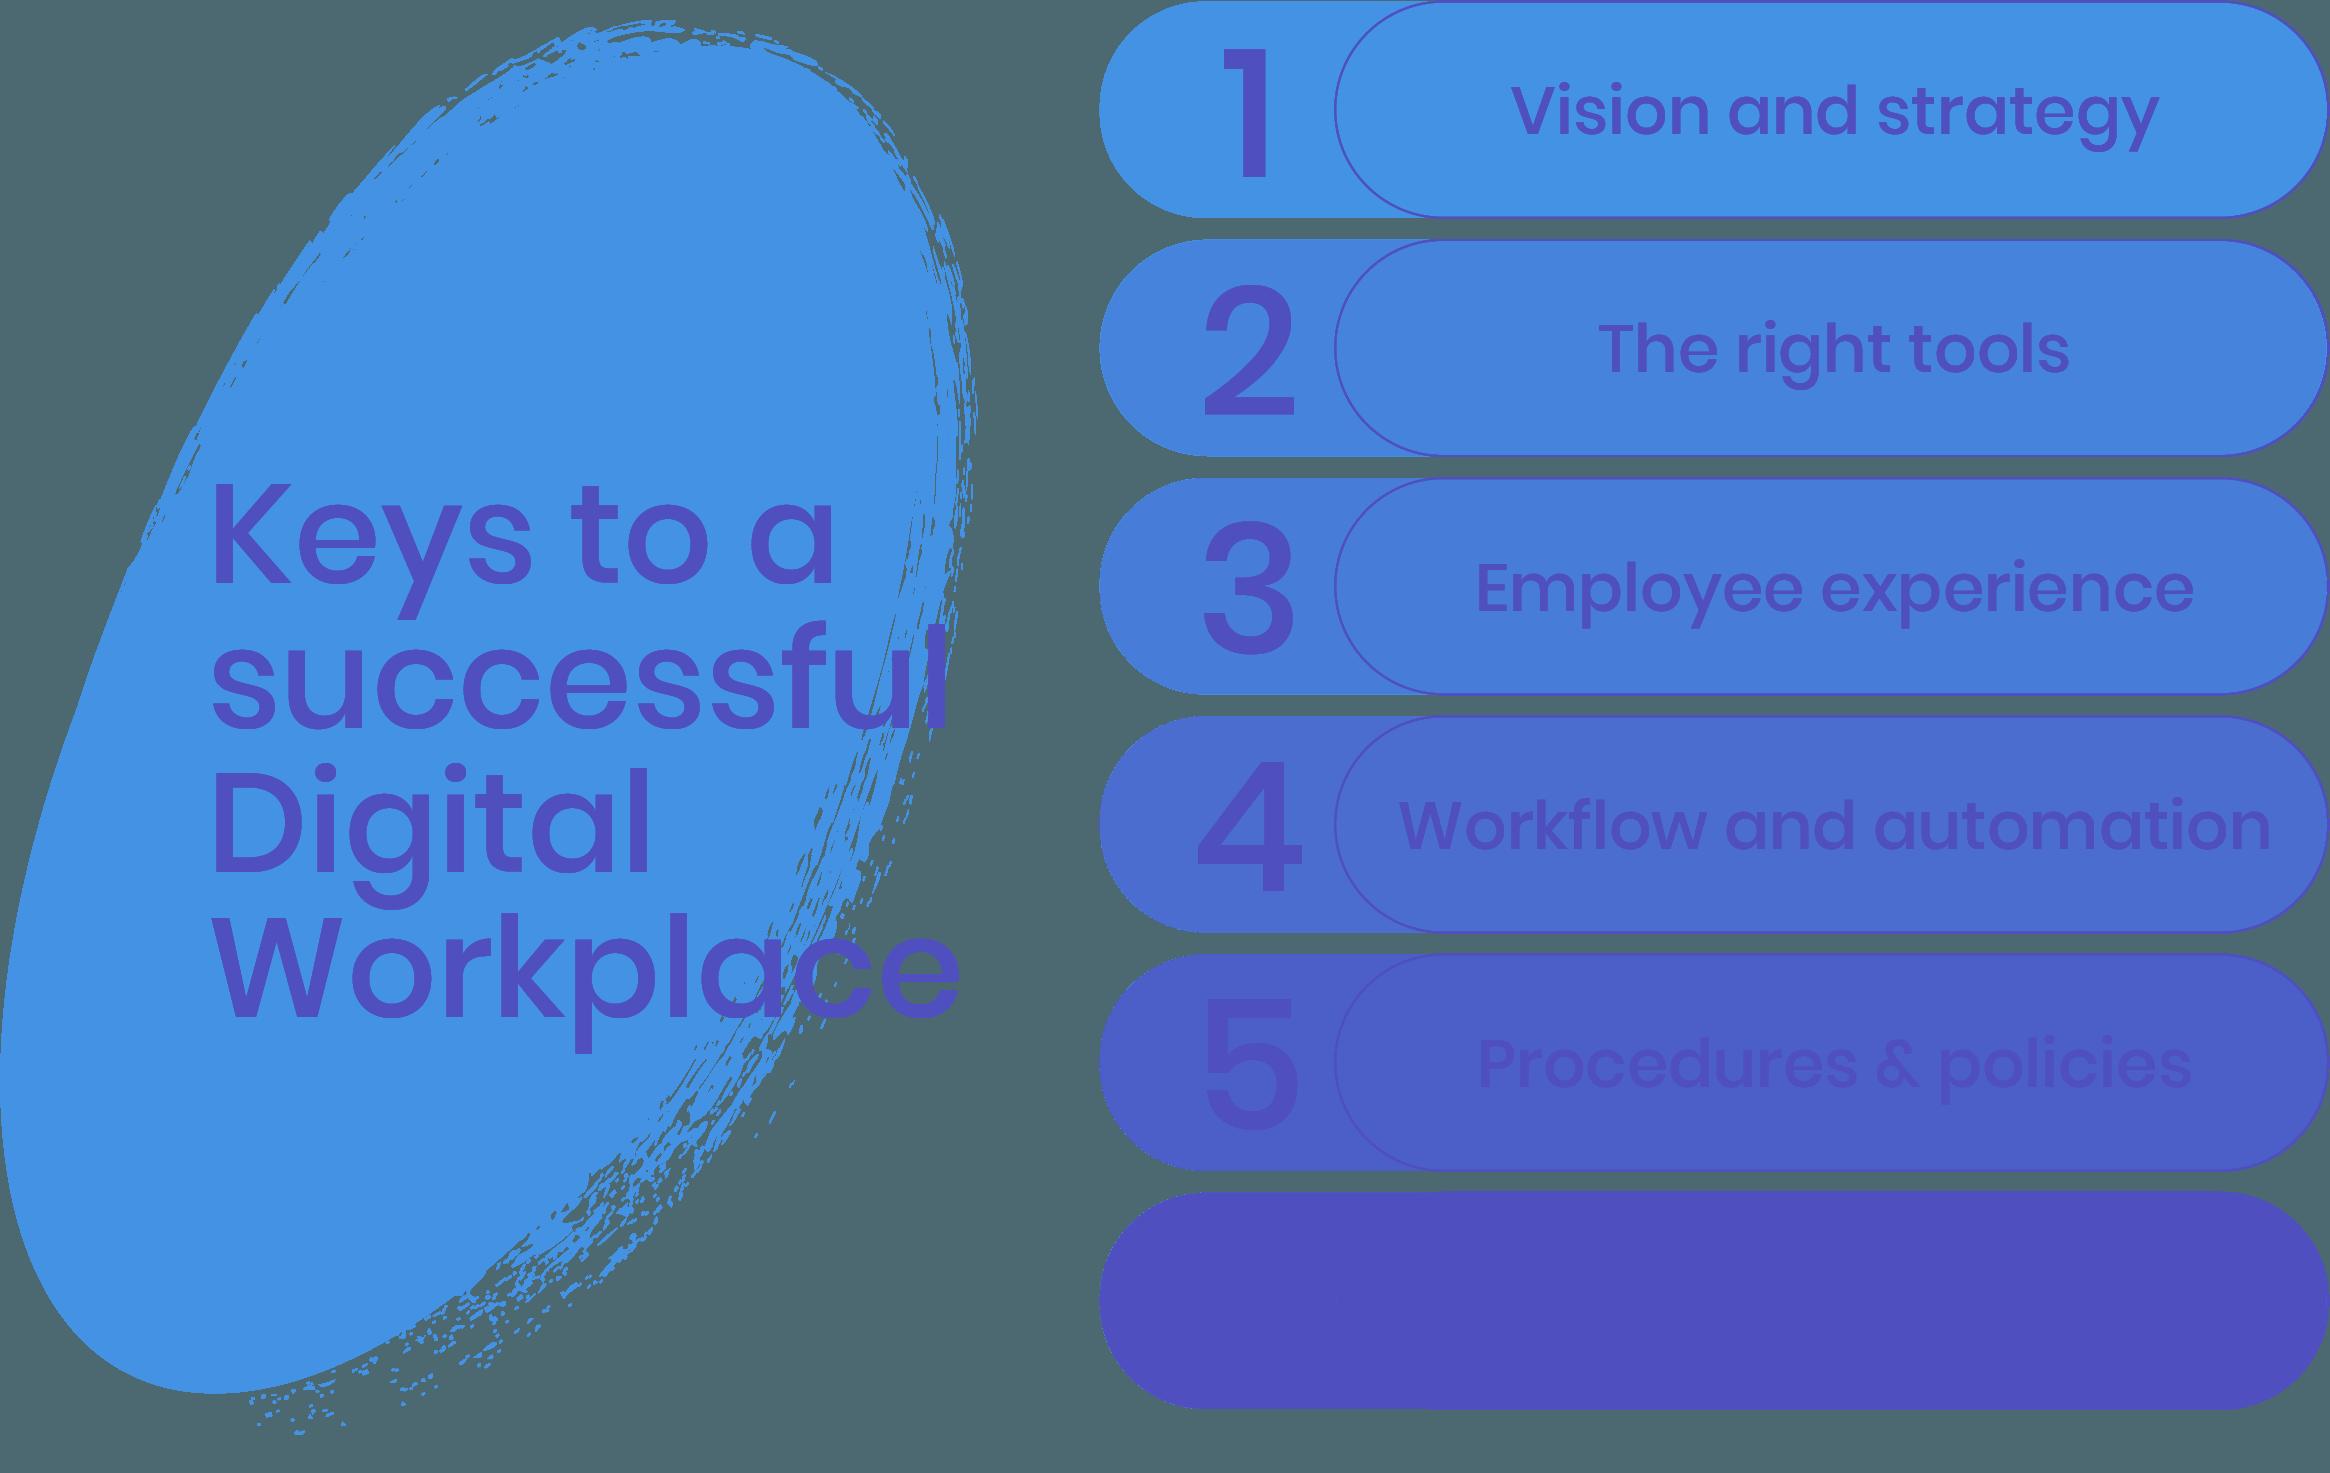 keys to a successful digital workplace